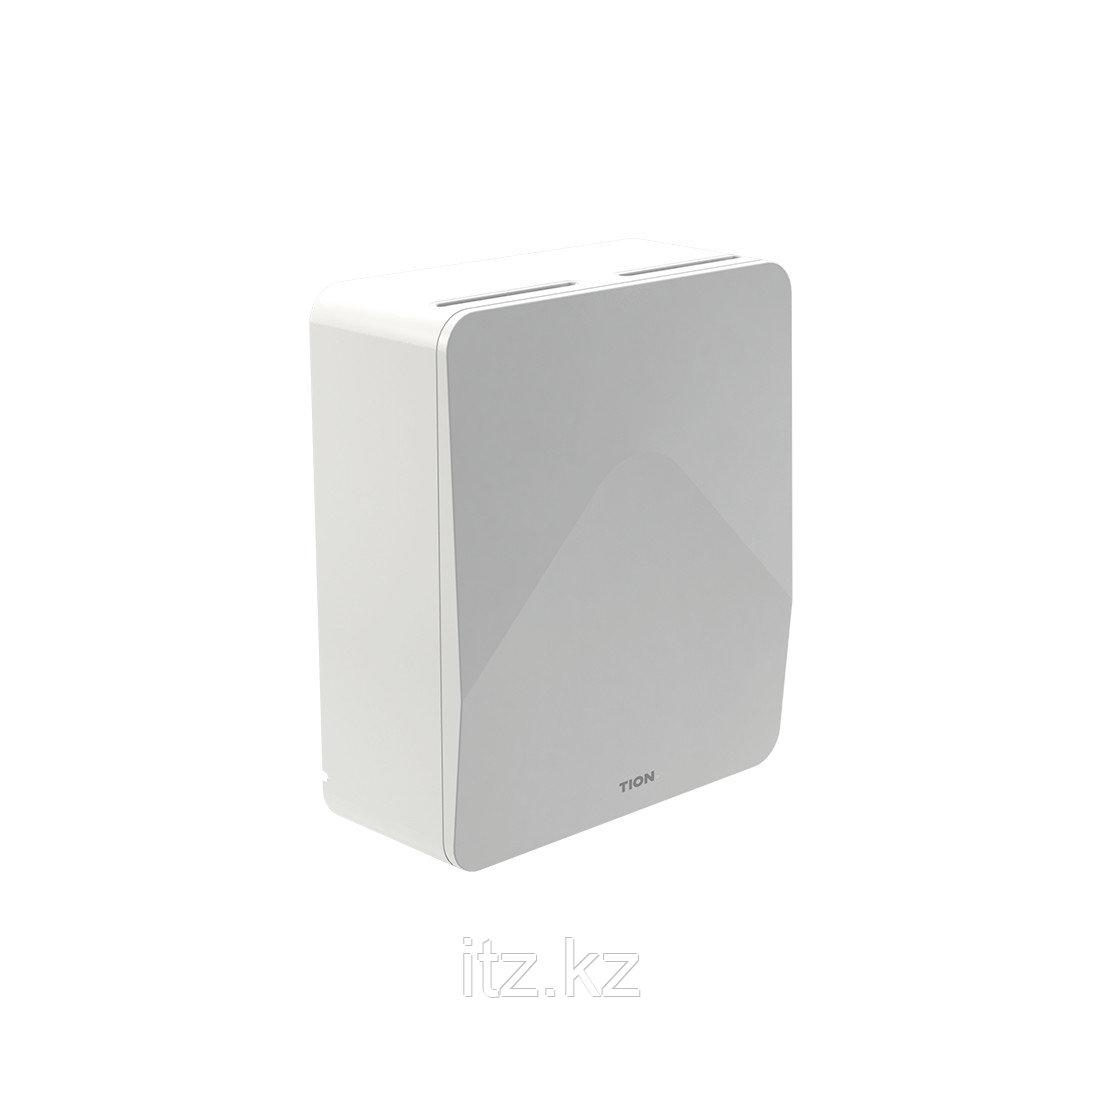 Tion Бризер 3S Smart